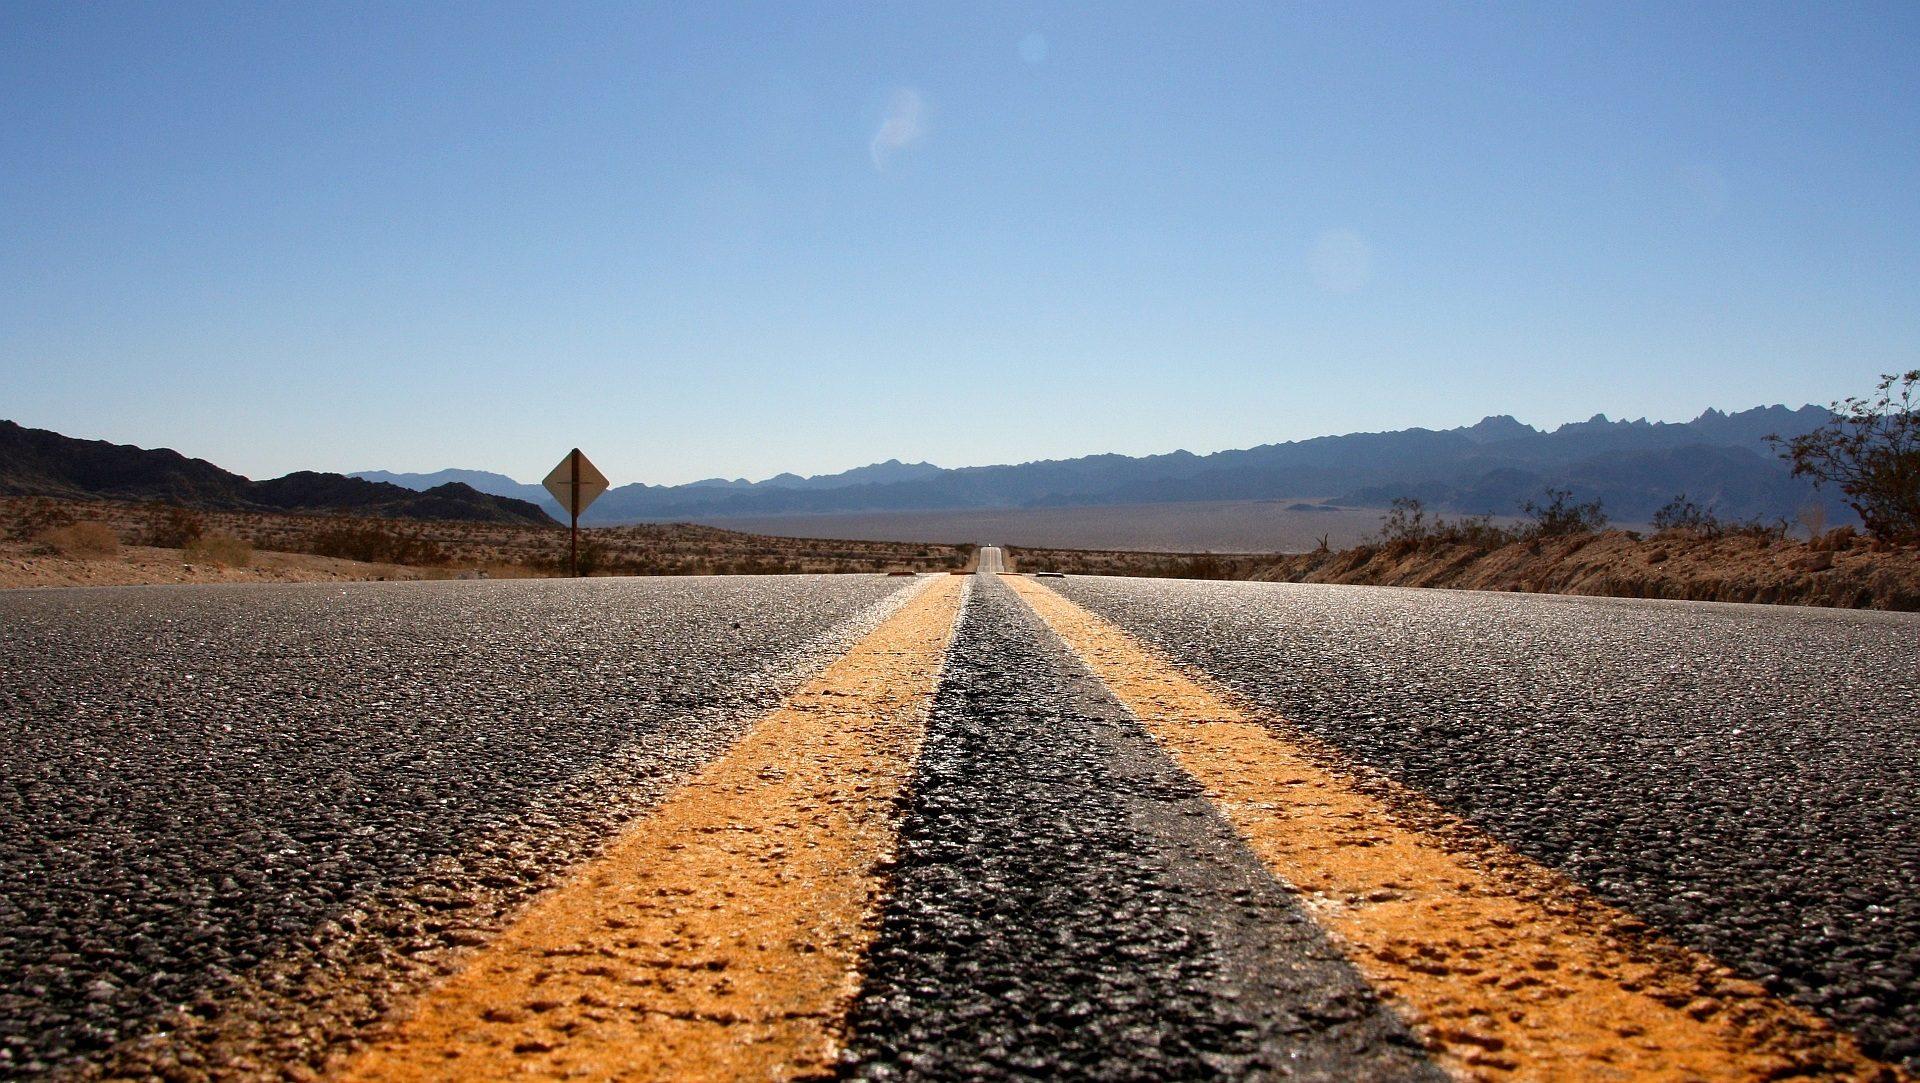 carretera, Strada, asfalto, Montañas, orizzonte, Avventura - Sfondi HD - Professor-falken.com